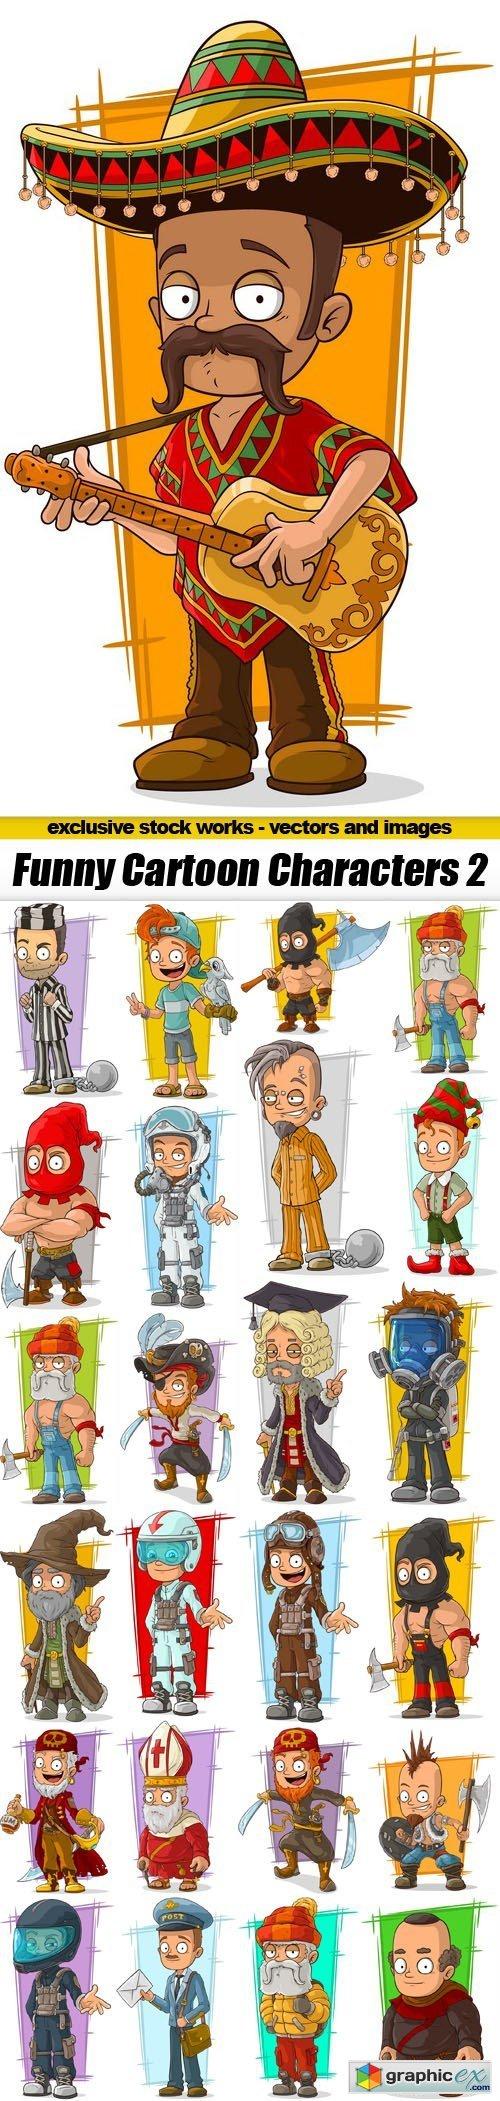 Funny Cartoon Characters 2 - 25xEPS